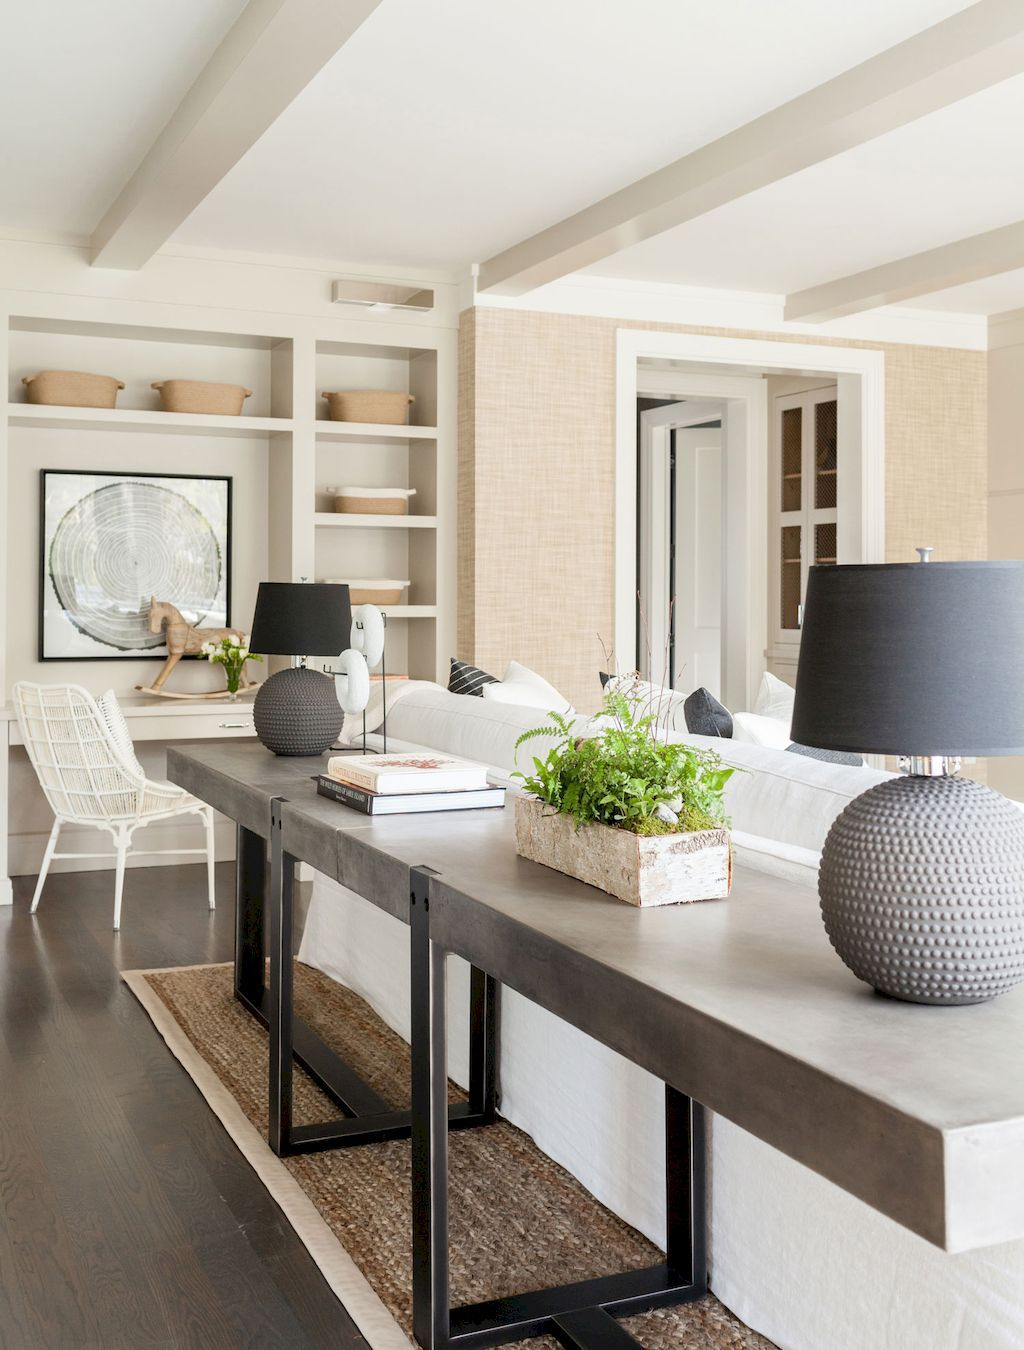 Home decor u Amazing Furniture Ideas Home decor Pinterest